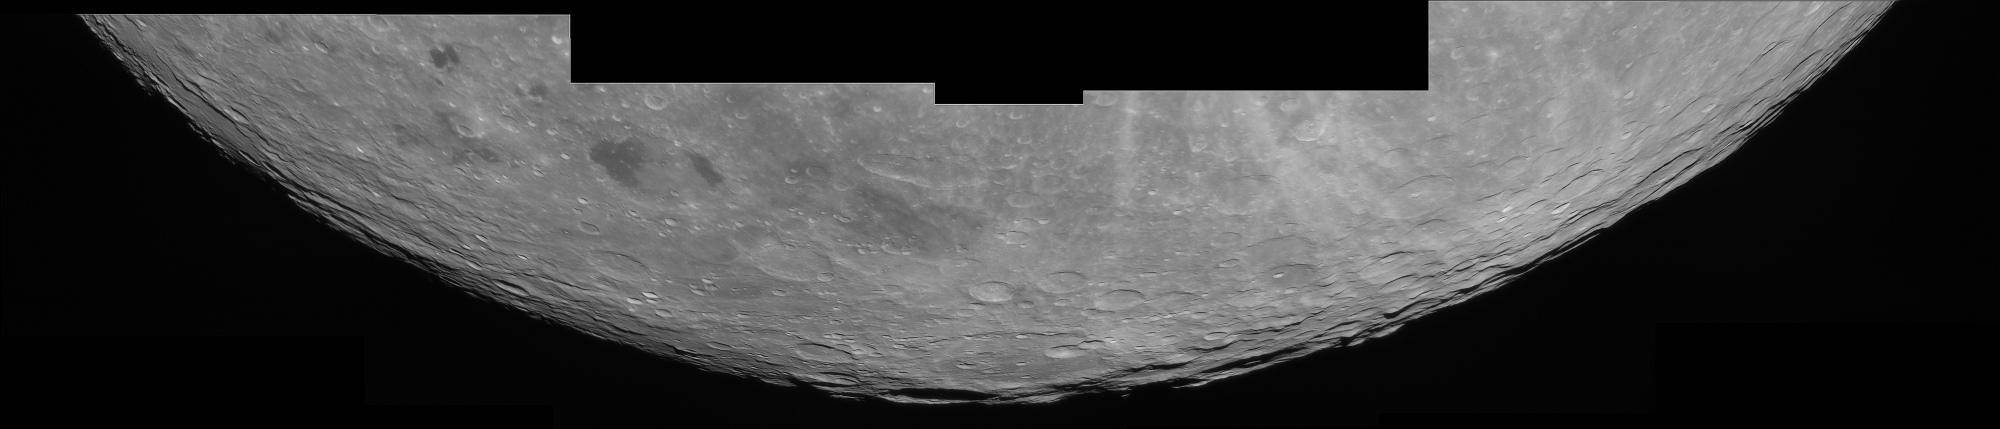 2021-02-26-2121_0-Moon_AS_P25_lapl6_ap1476_stitch.thumb.jpg.86b5ccdc2f564176652bbb5514fd27ee.jpg